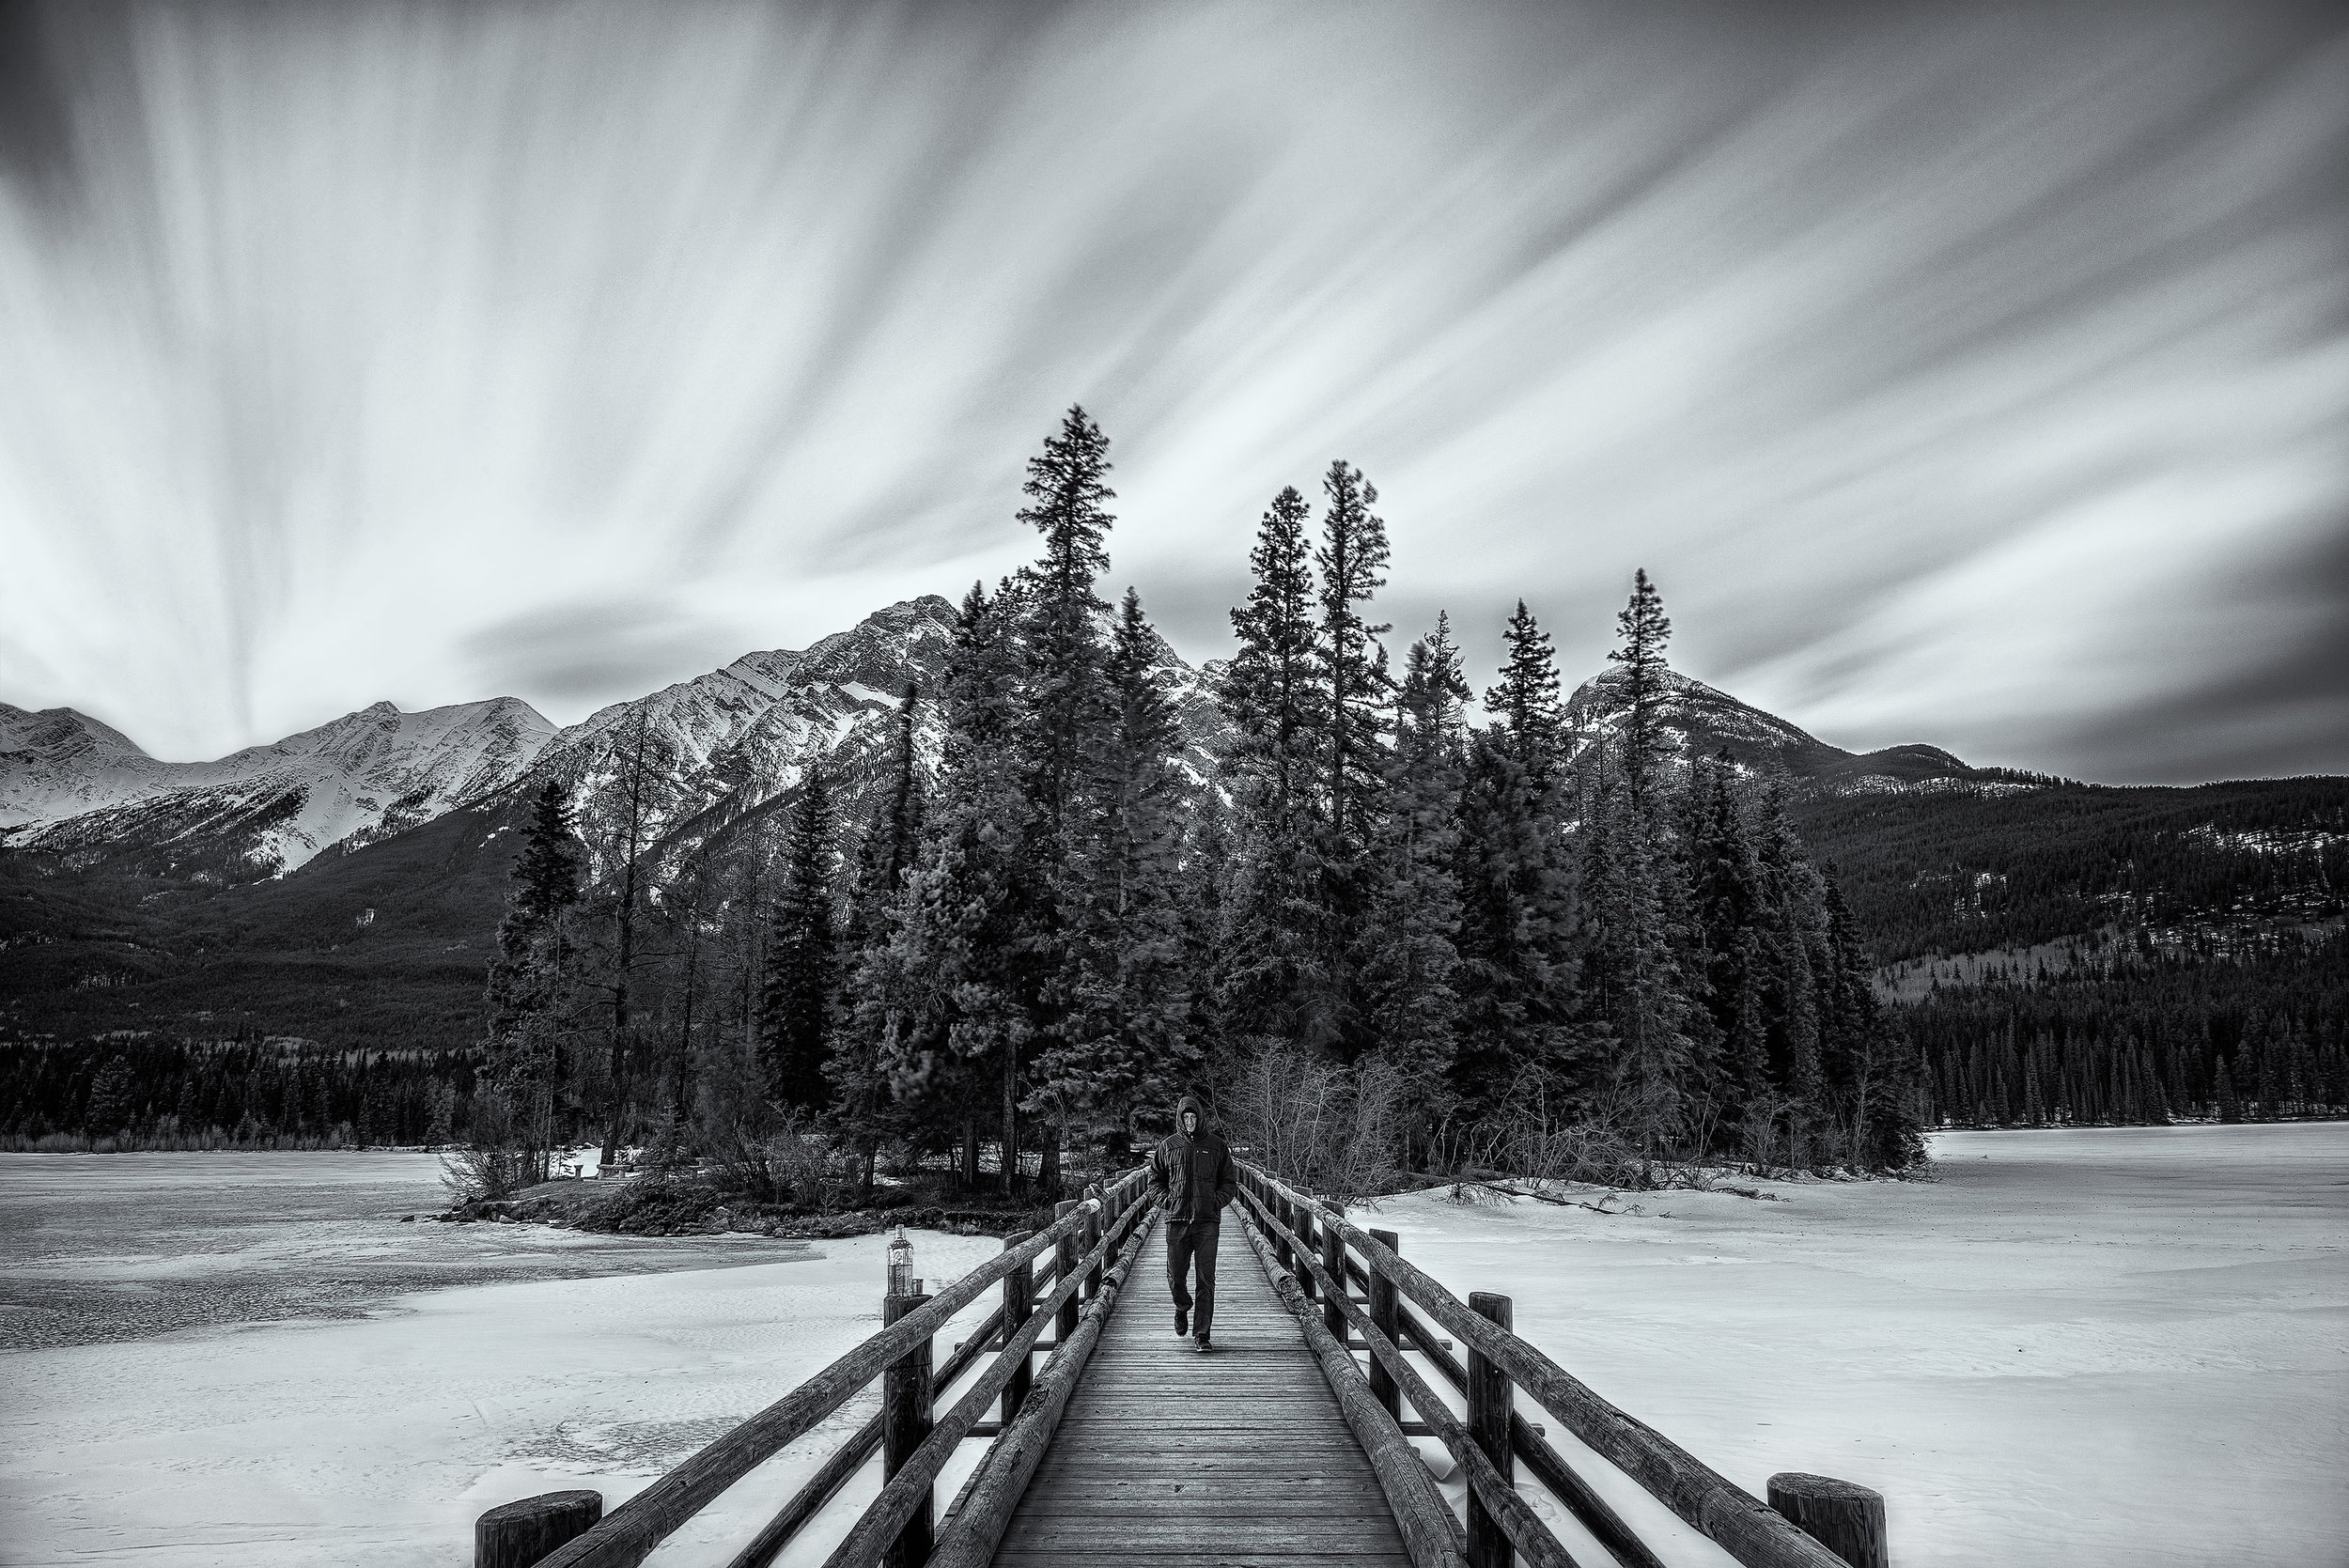 austin-trigg-whiskey-banff-alberta-product-TINCUP-Pyramid-lake-Island-long-exposure-jasper-black-white.jpg